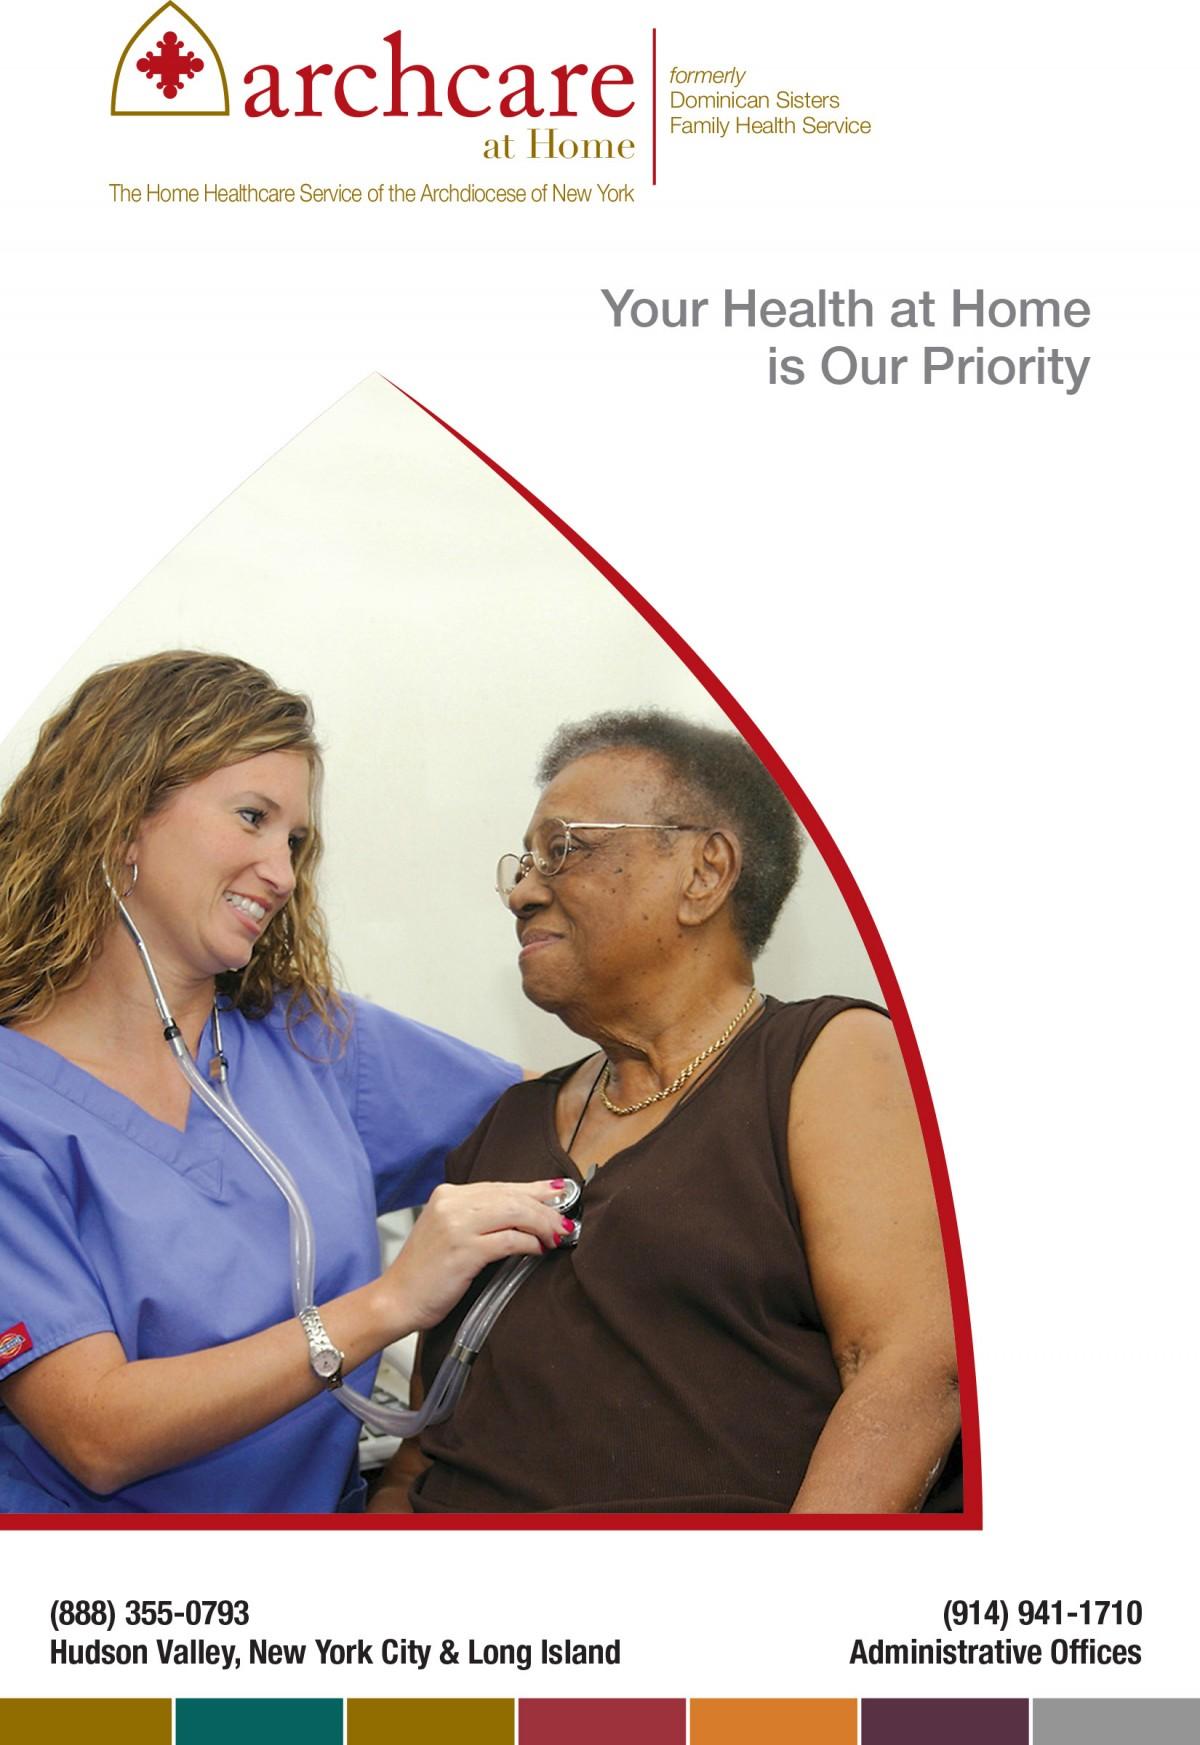 ArchCare Homecare brochure